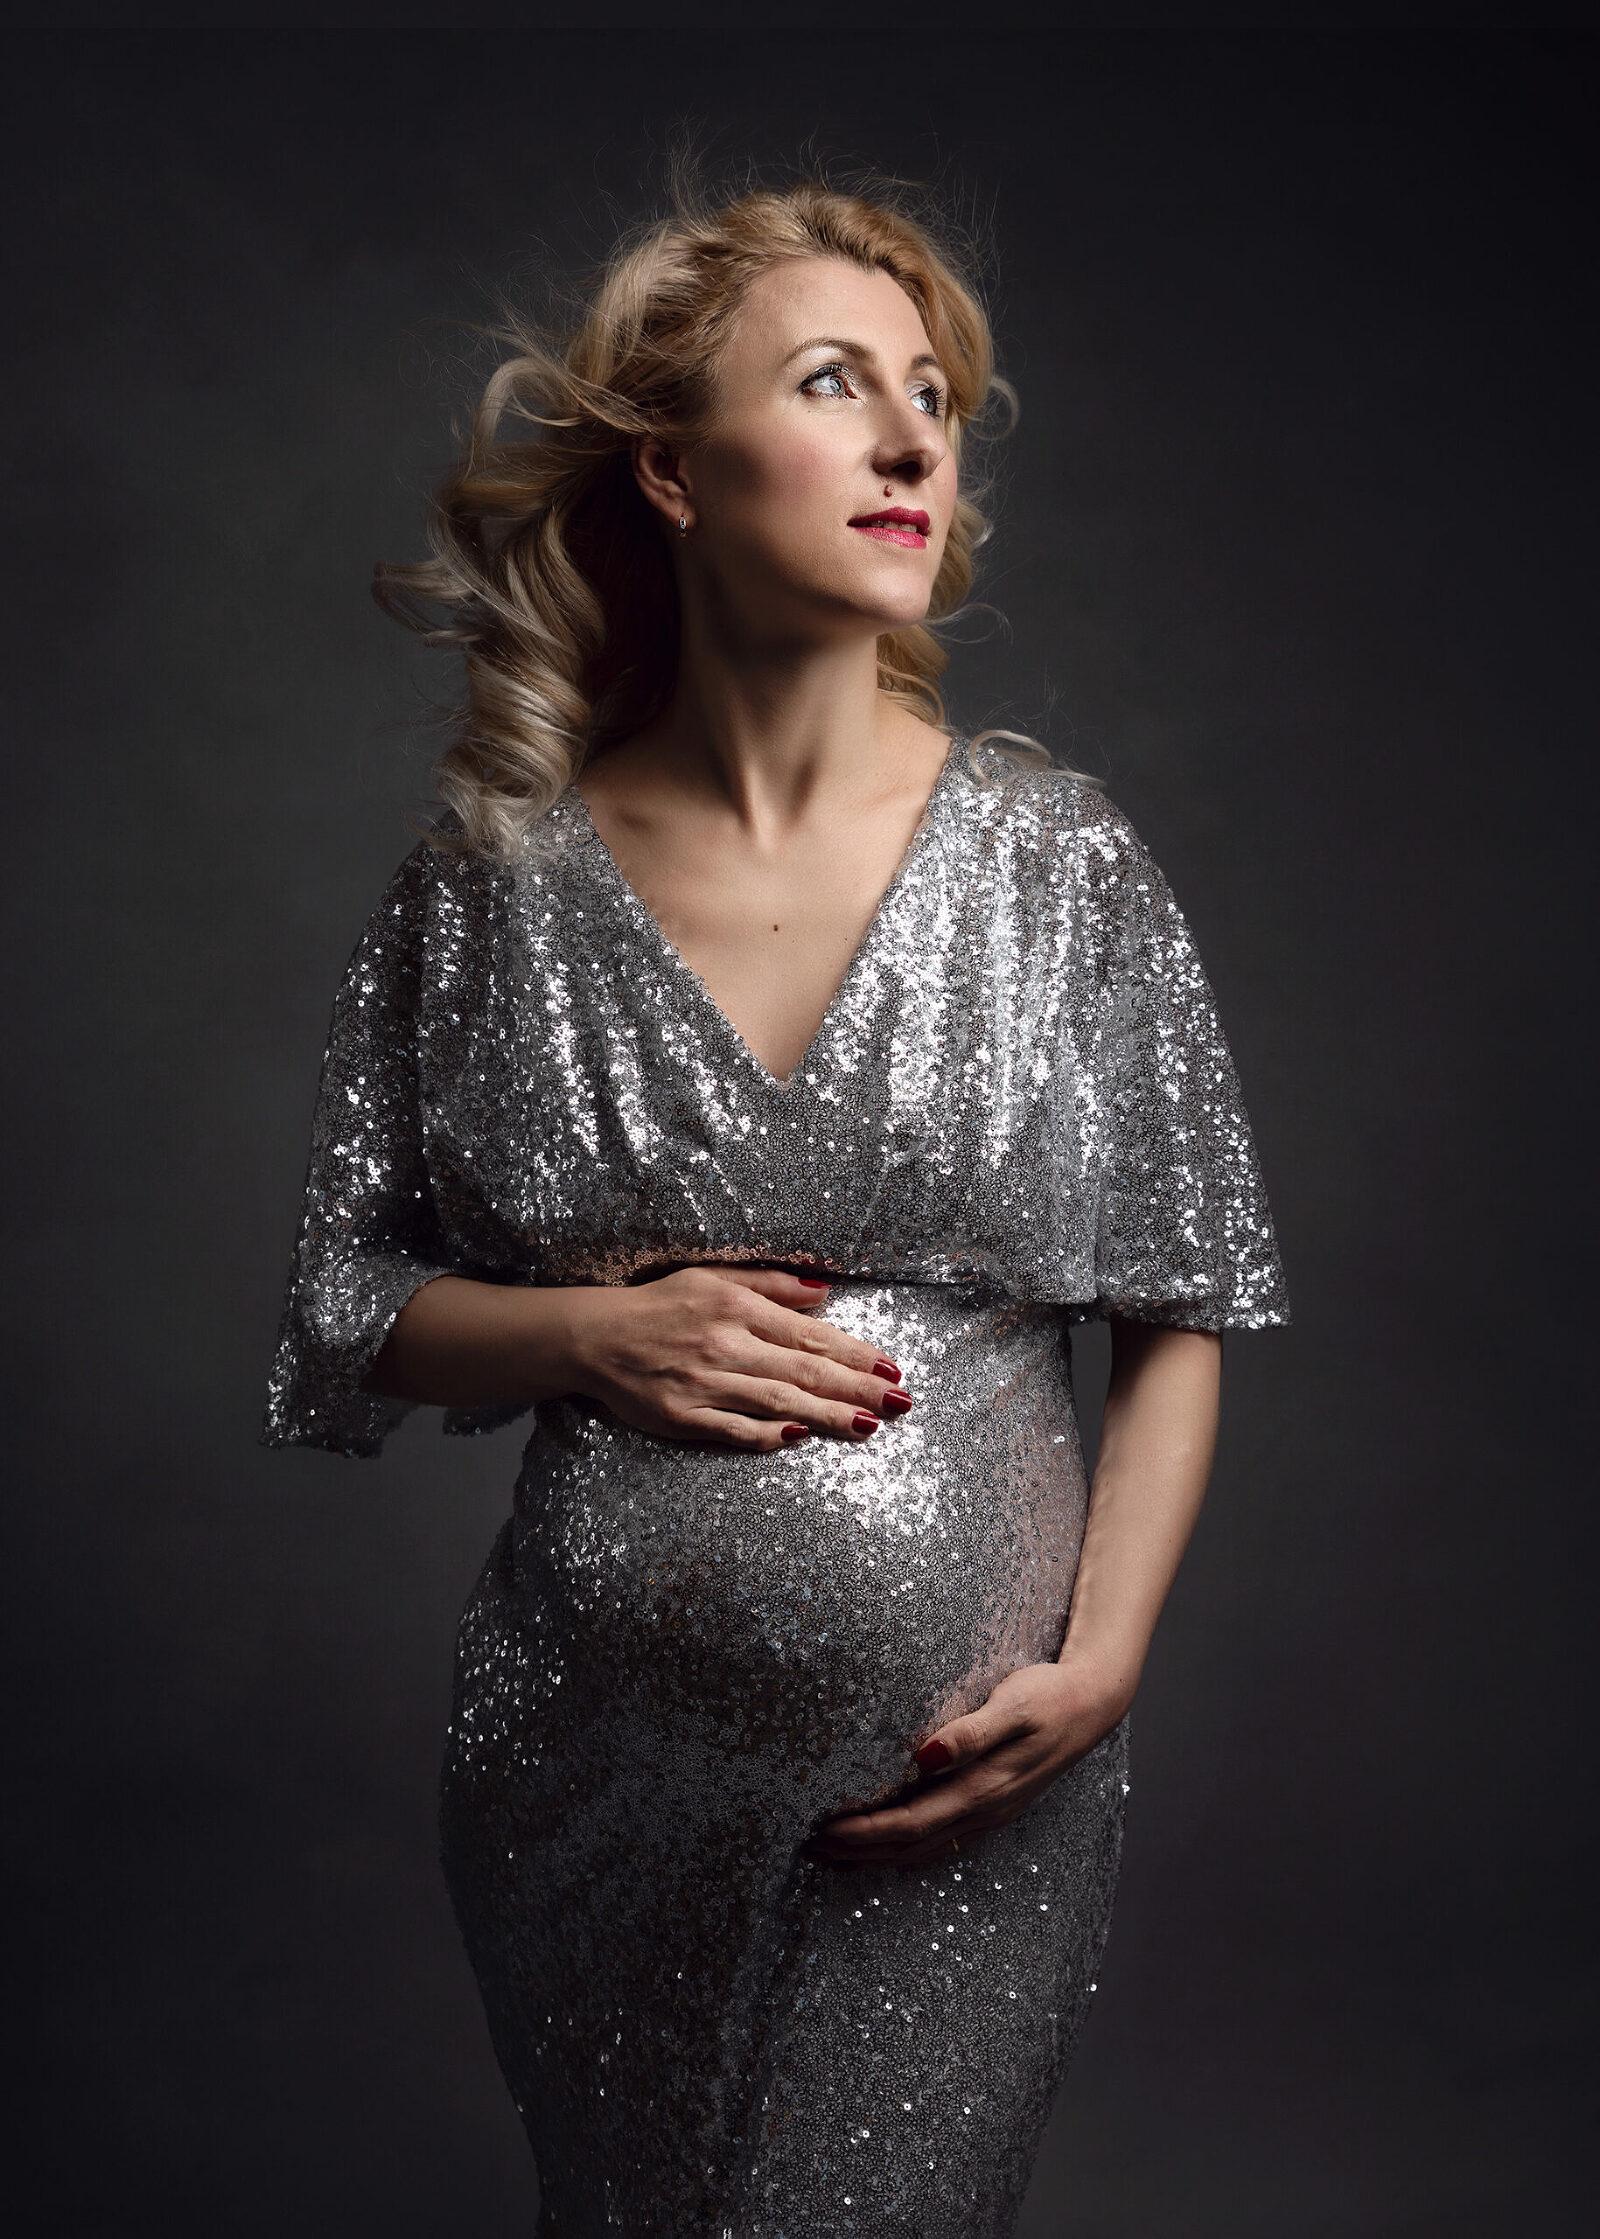 Maternity studio photoshoot Hereford, Herefordshire